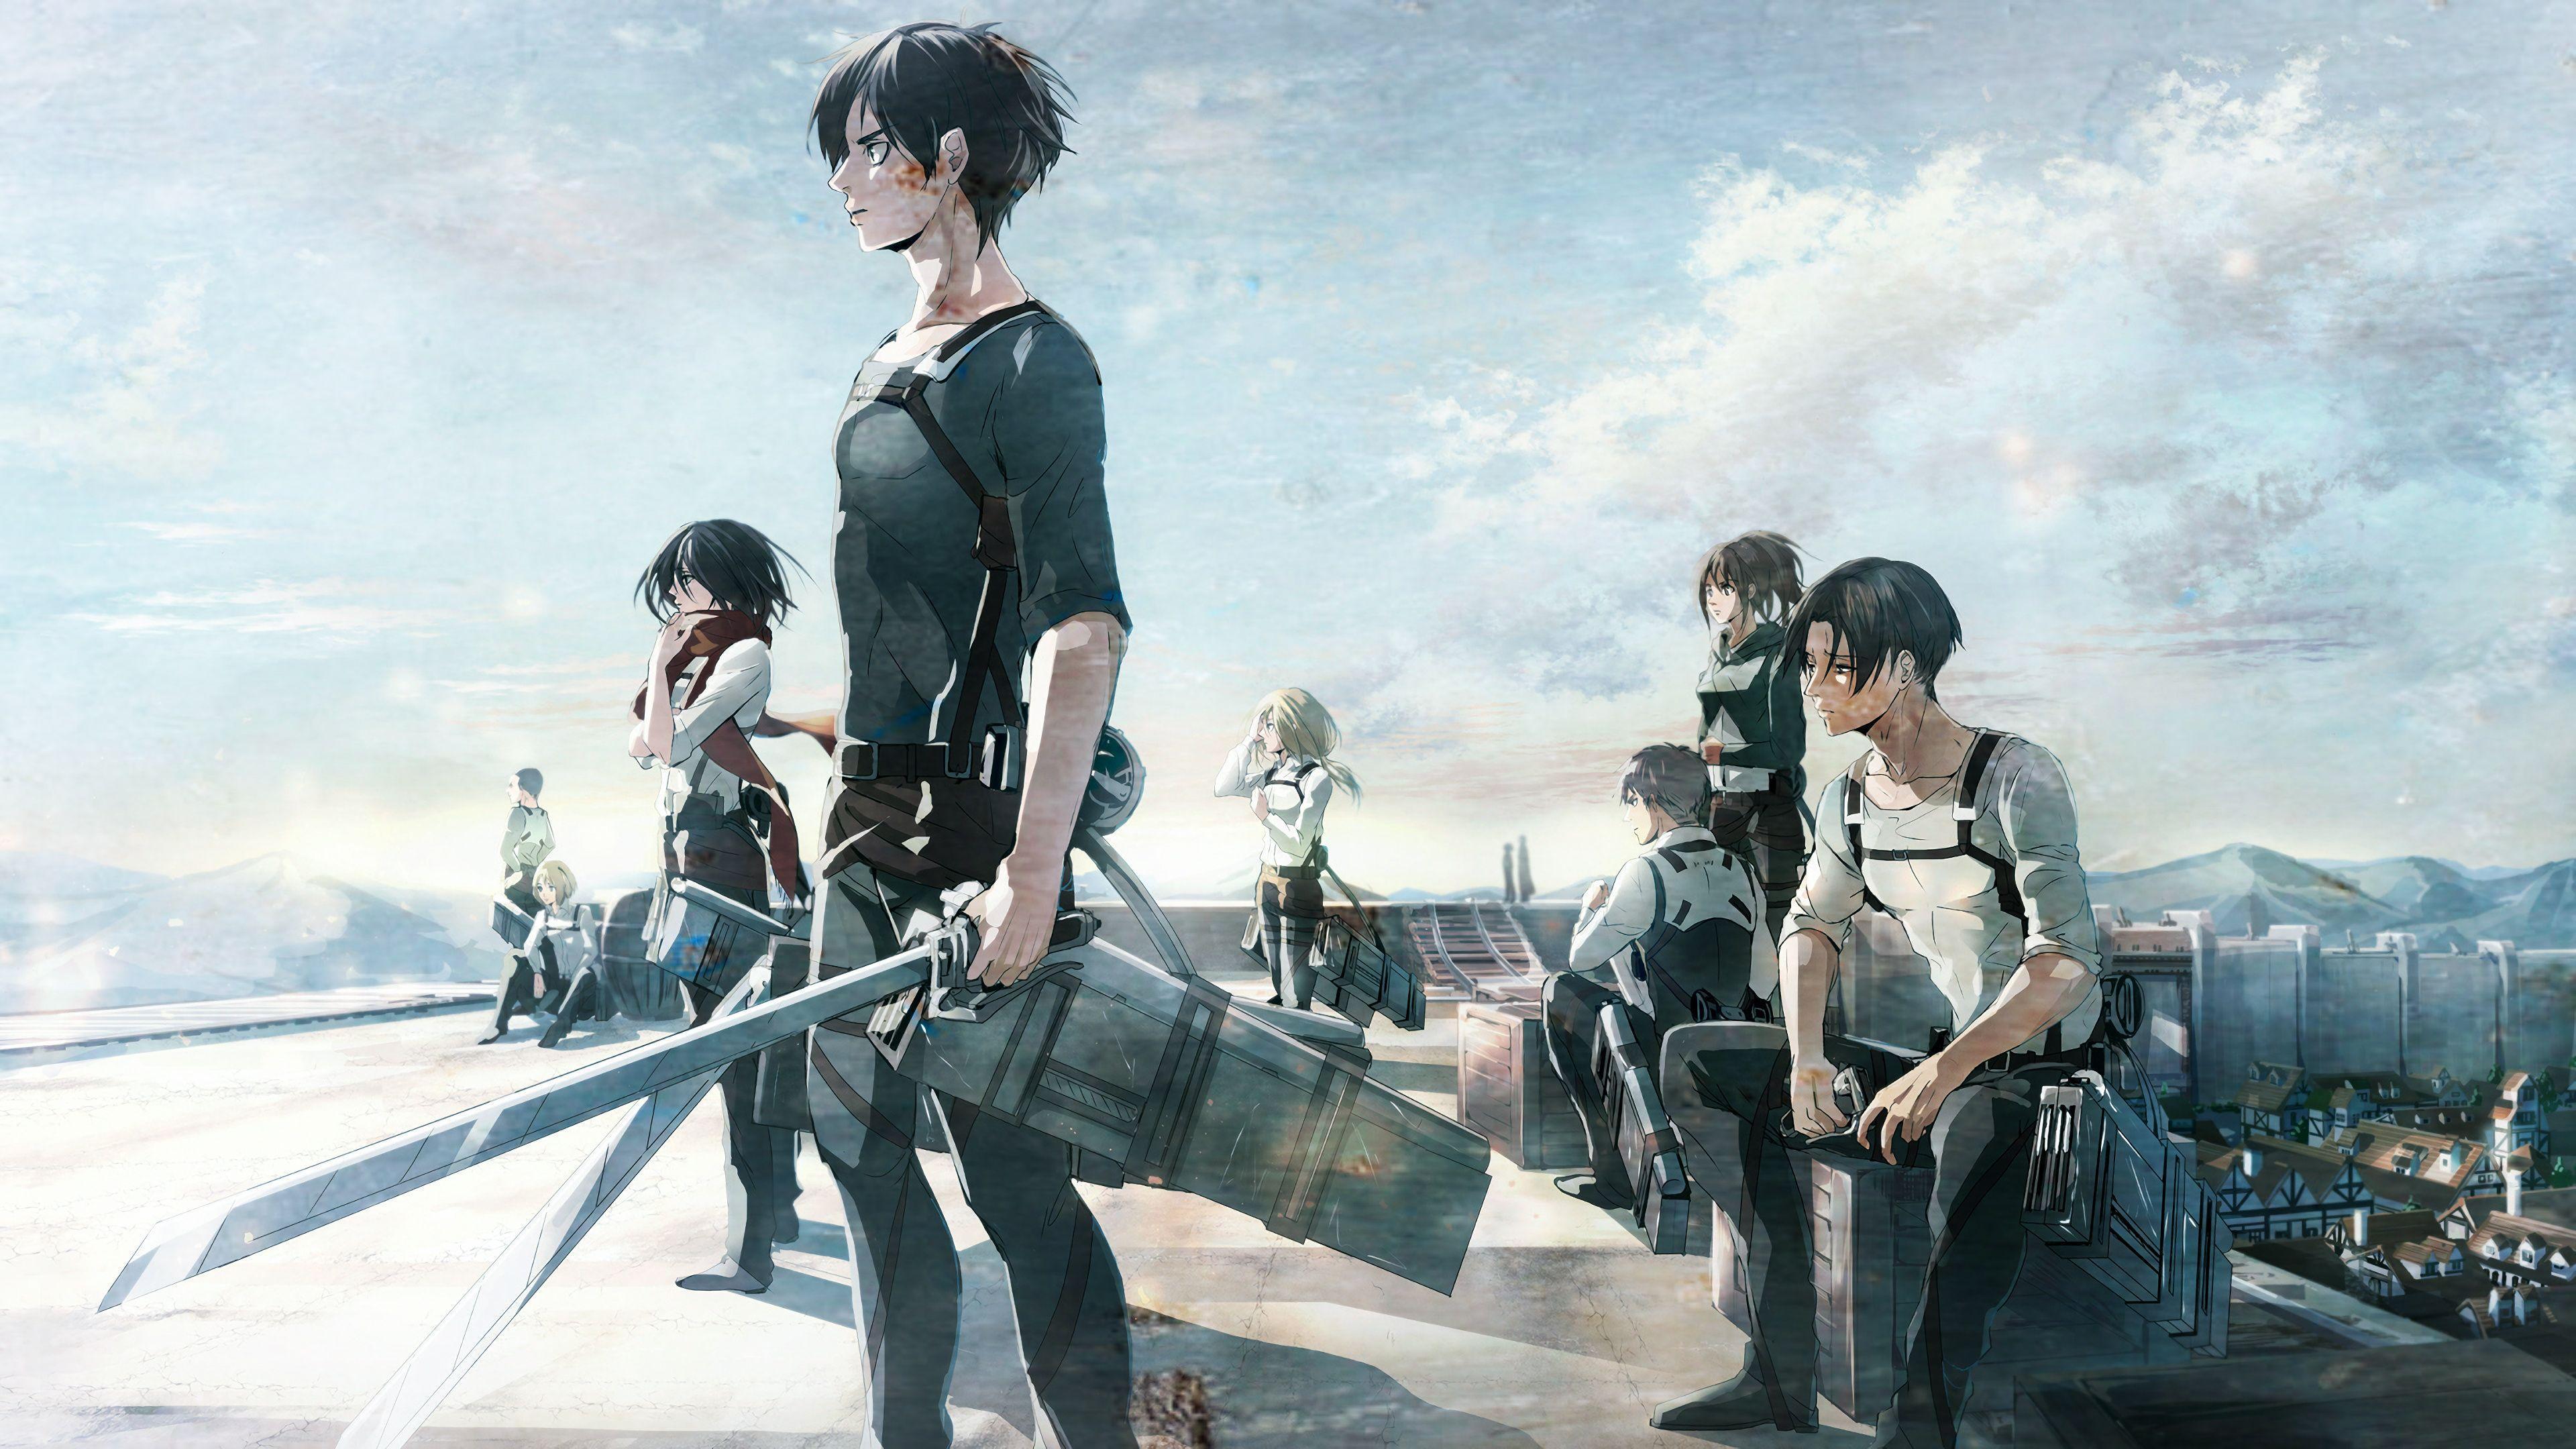 3840x2160 Attack on Titan Season 3 background 21. Games wallpaper HD